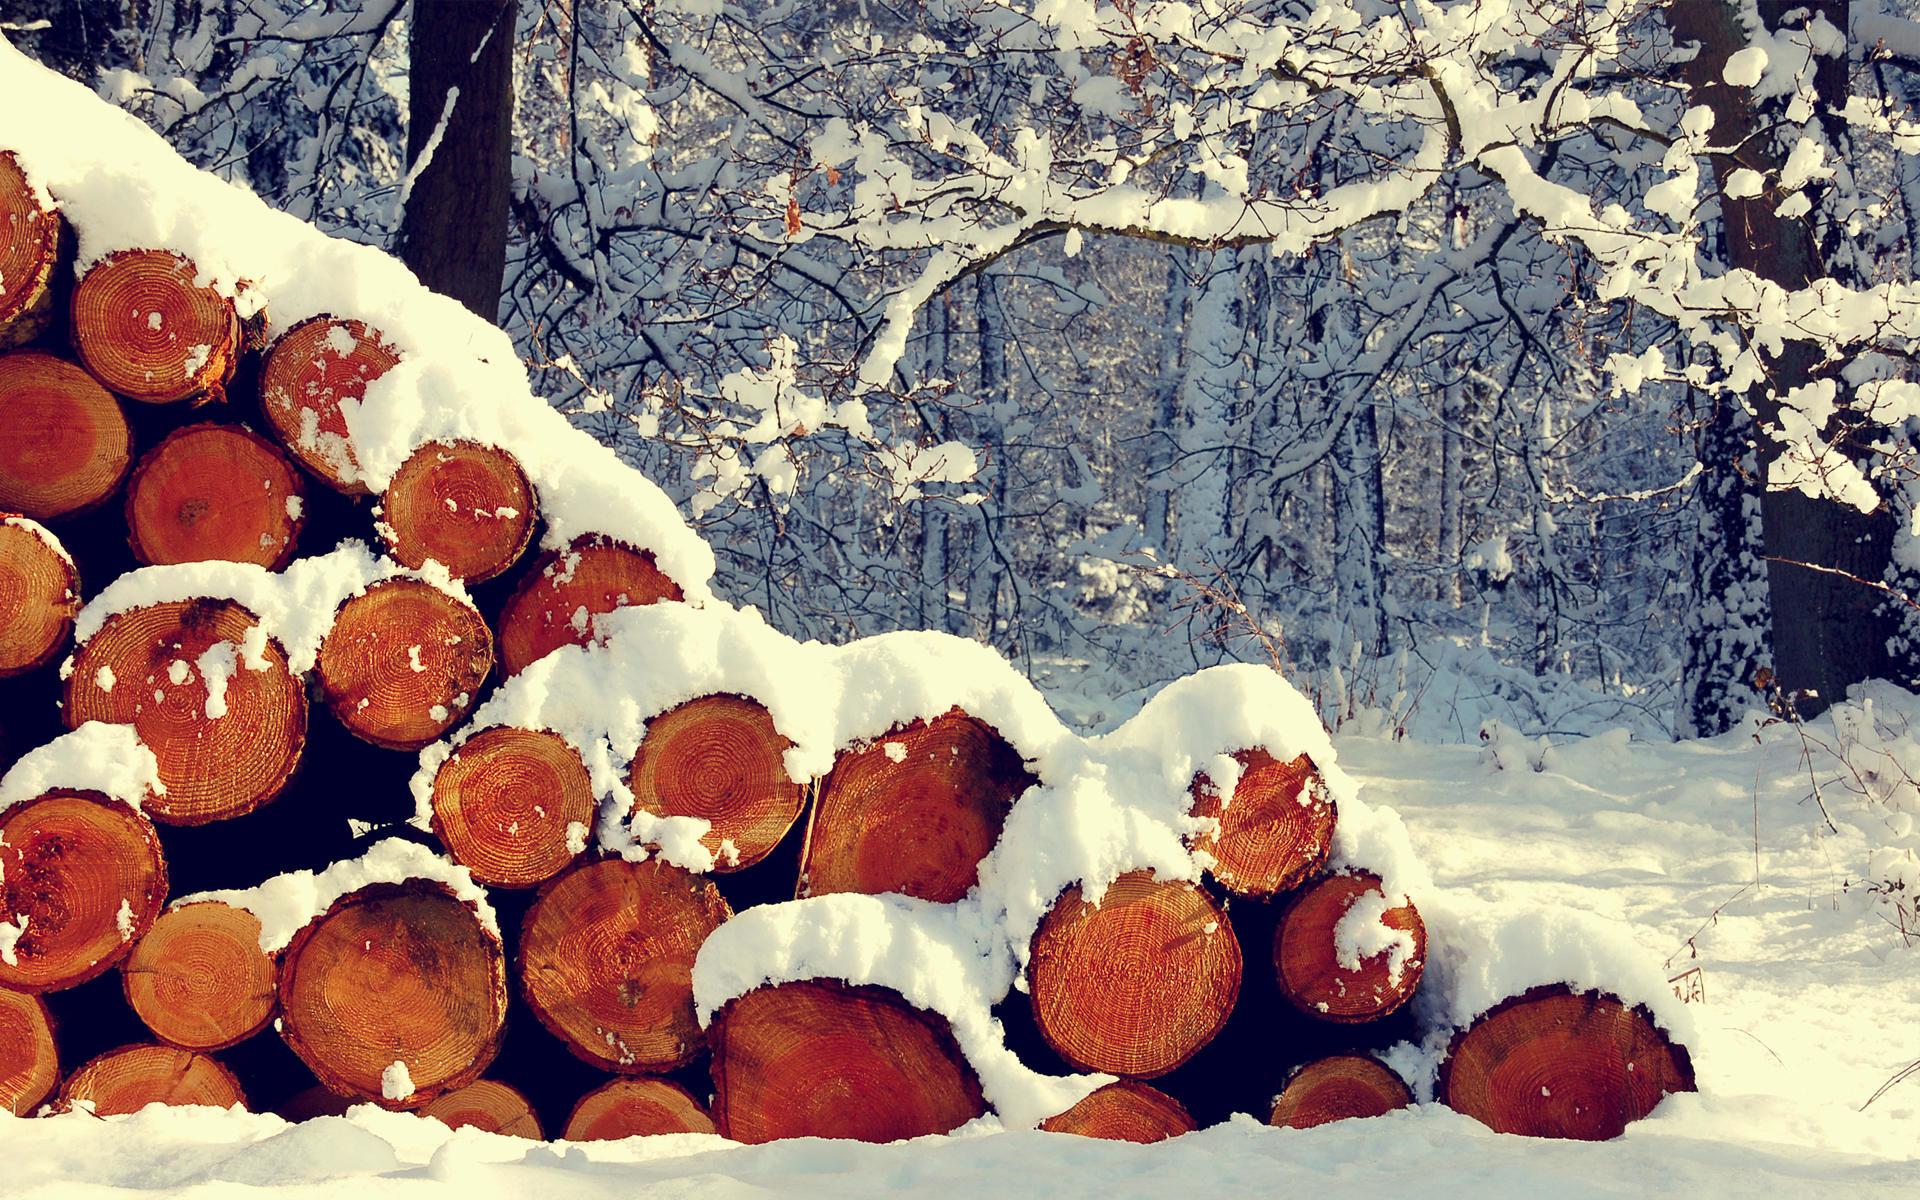 Winter Comes HD Wallpaper